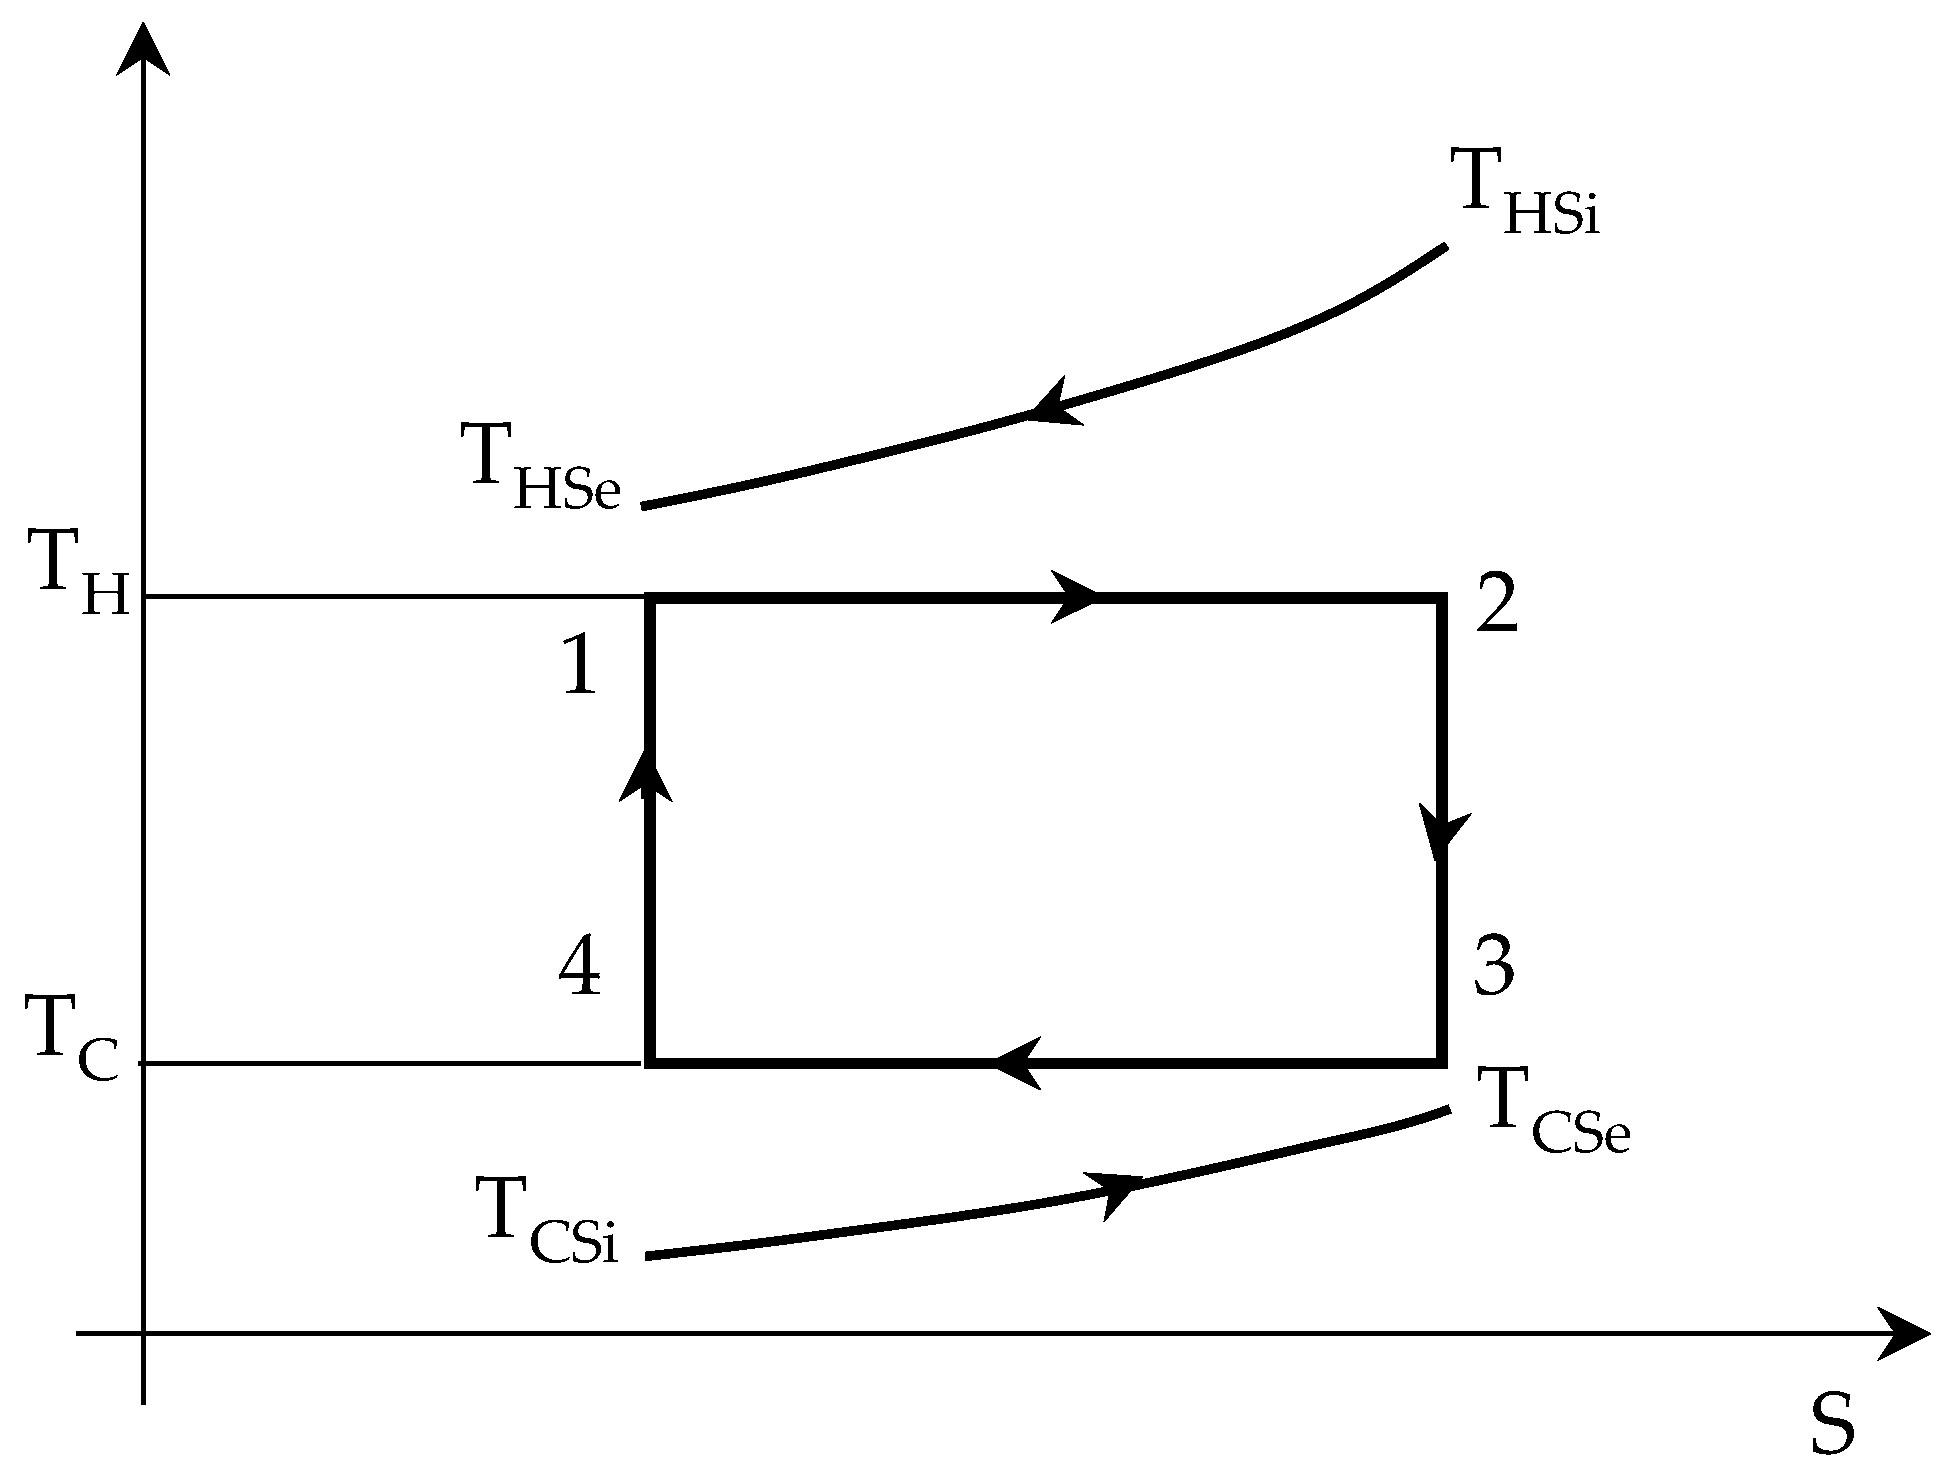 Carnot Engine Pv Diagram Entropy Free Full Text Of Carnot Engine Pv Diagram